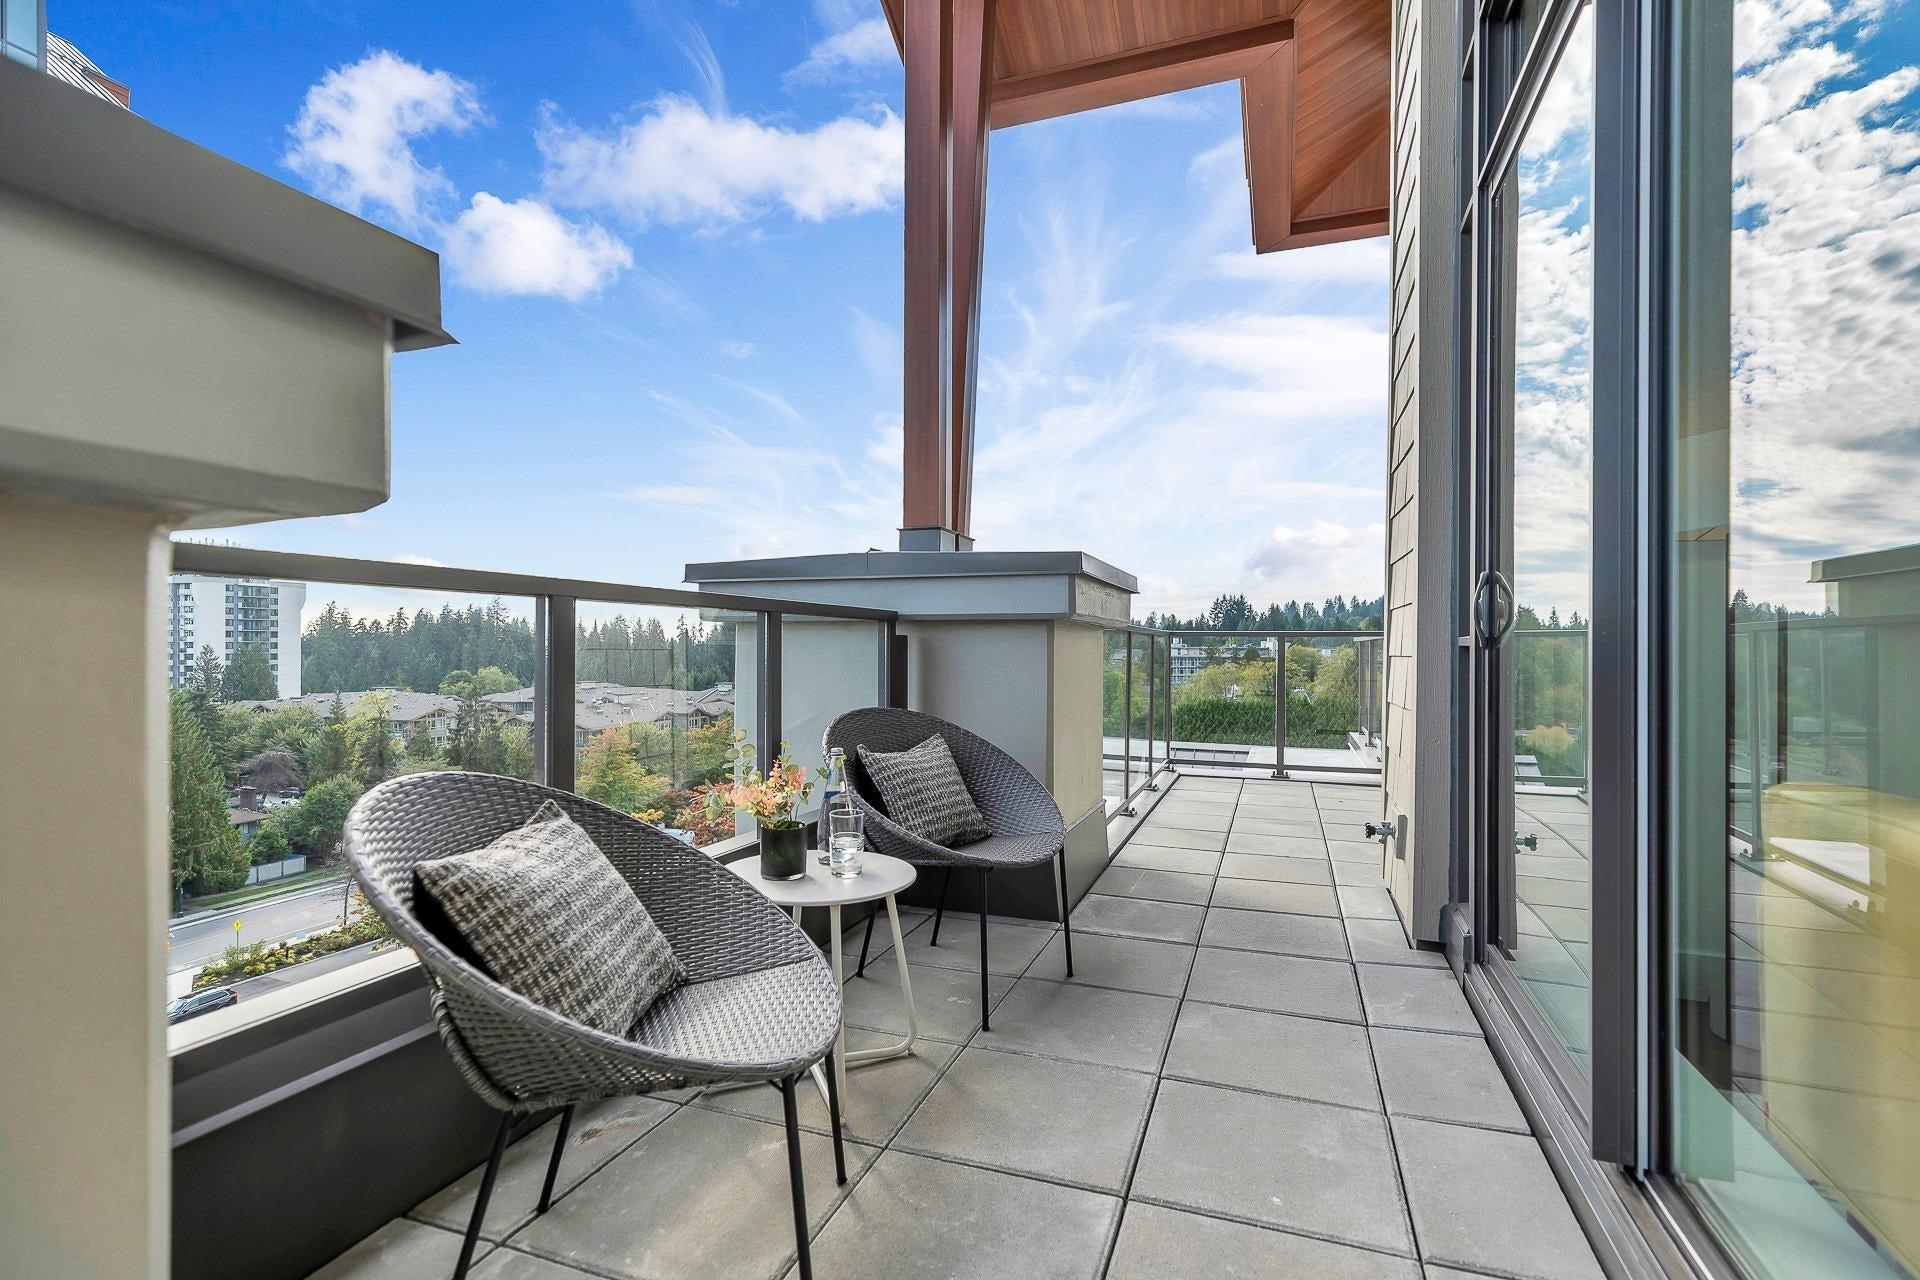 702 2780 VALLEY CENTRE AVENUE - Lynn Valley Apartment/Condo for sale, 3 Bedrooms (R2622279) - #23